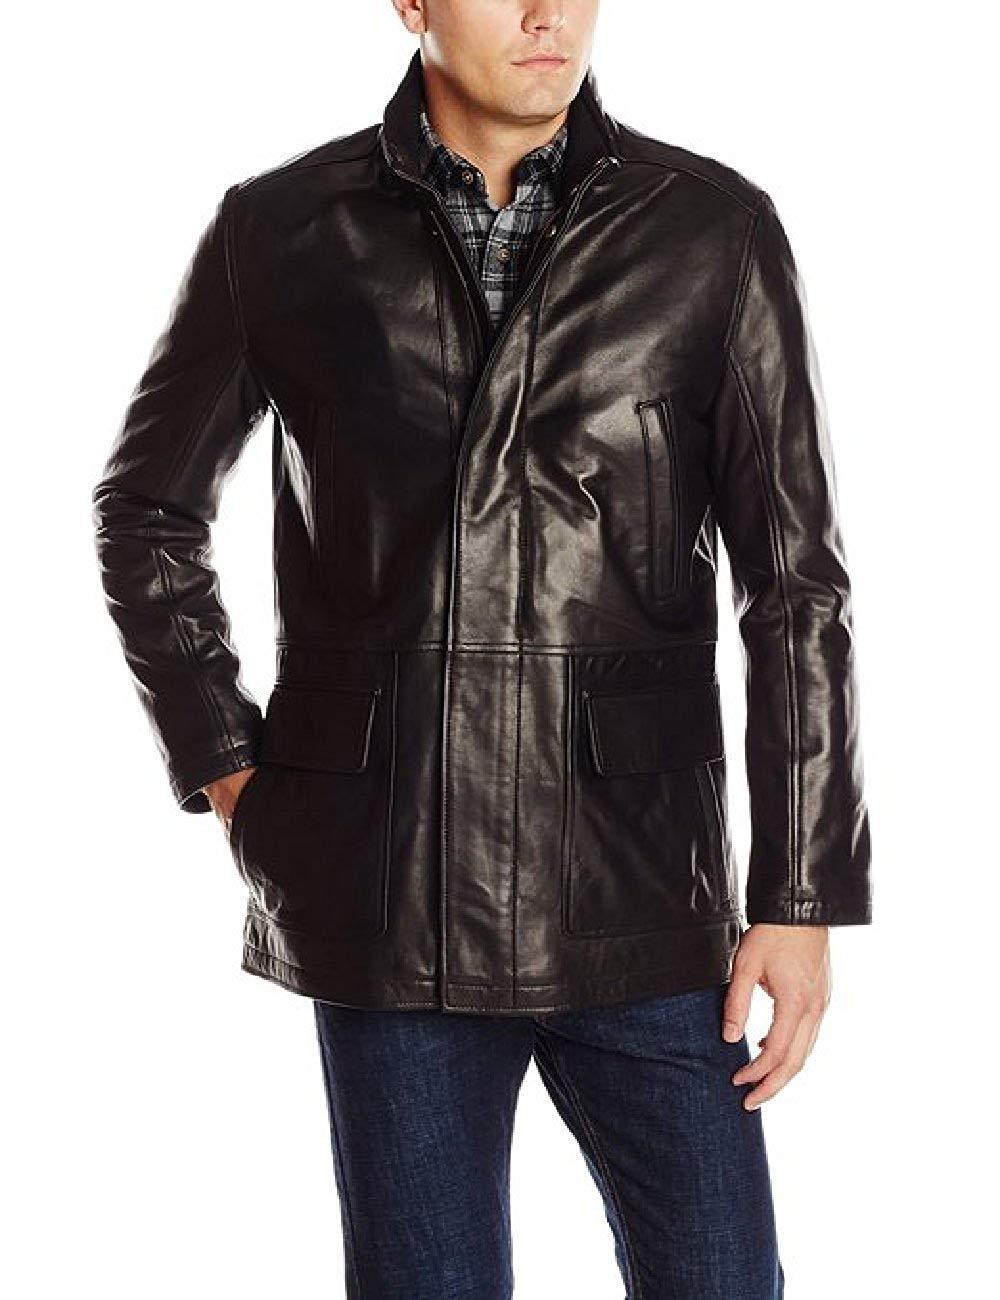 smith-rhyner Men Genuine Premium Leather Western Style Outwear Full Sleeve Blue Jacket